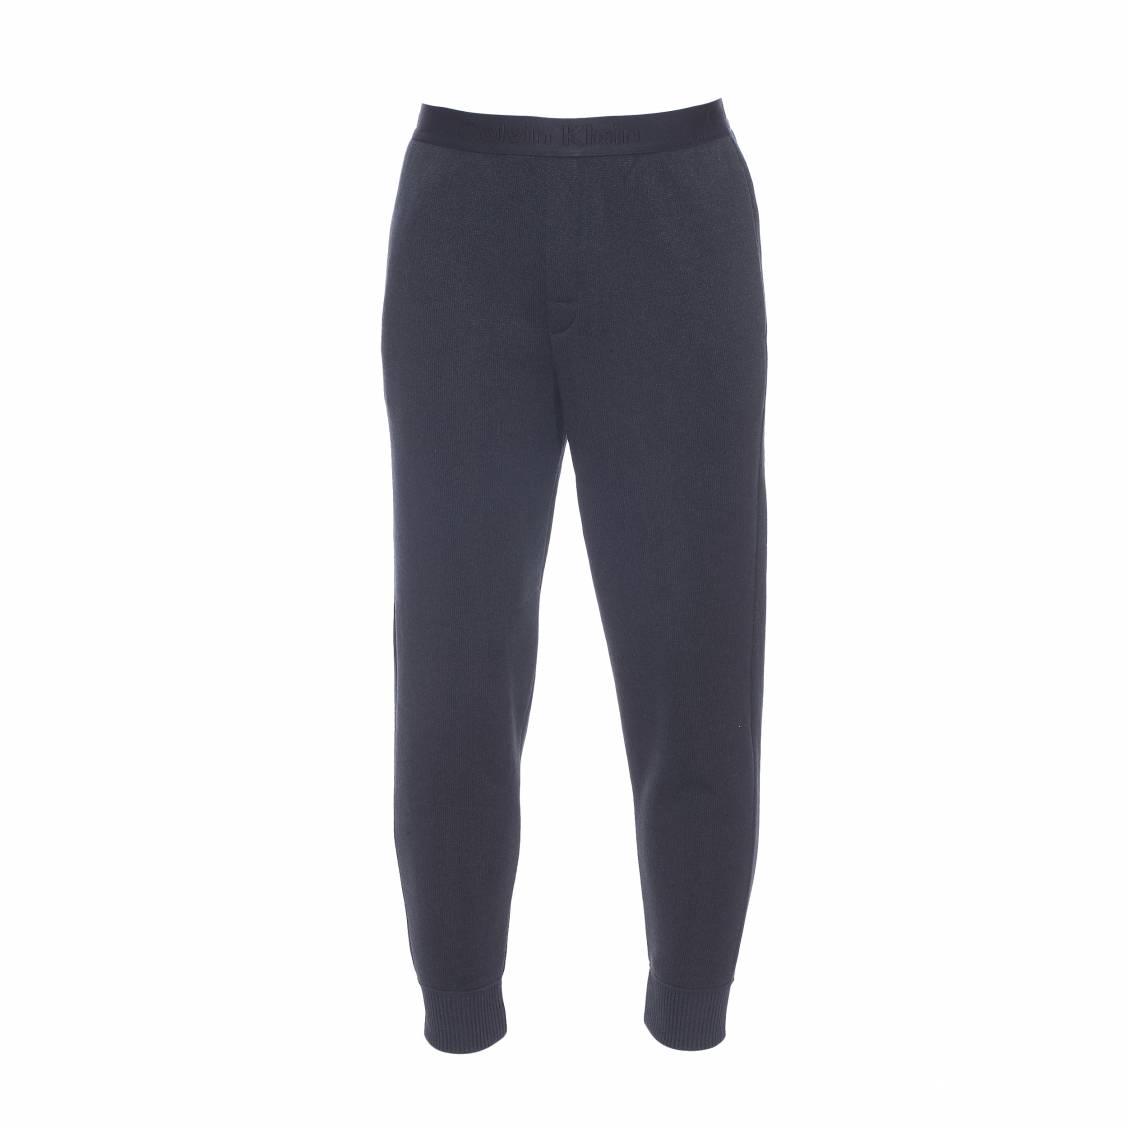 pantalon d 39 int rieur forme jogging calvin klein noir rue des hommes. Black Bedroom Furniture Sets. Home Design Ideas